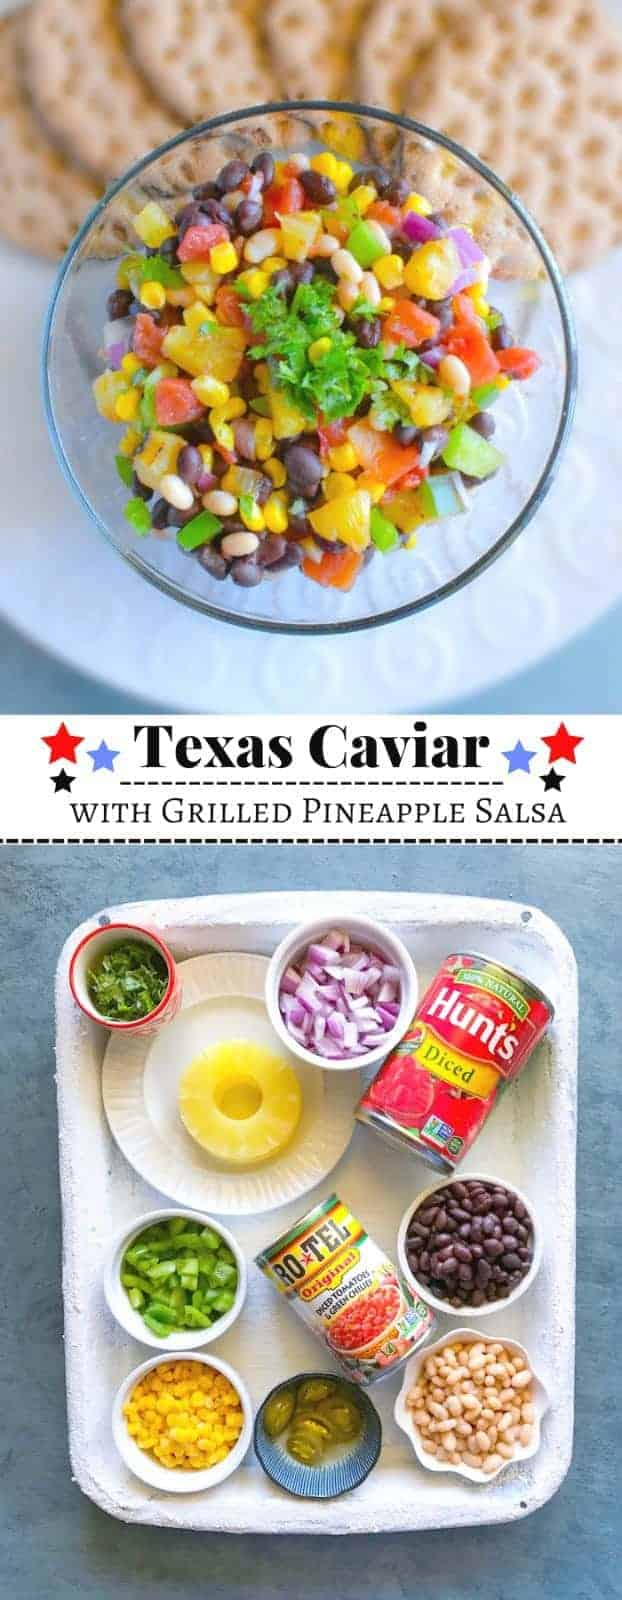 Texas Caviar with Grilled Pineapple Salsa: #texas #caviar #cowboy #ad #ServeUpSummer @walmart